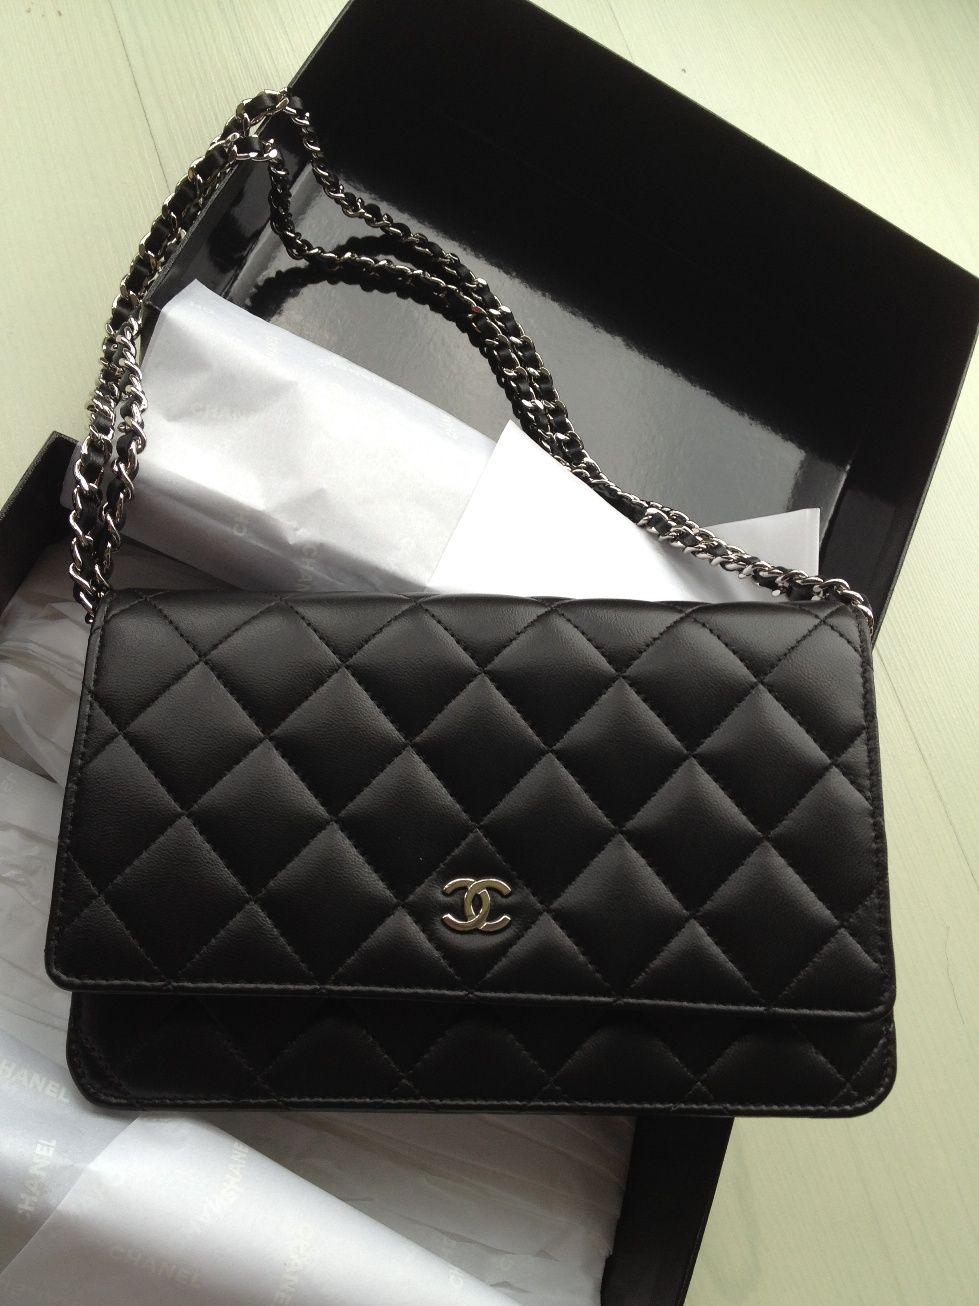 replica bottega veneta handbags wallet definition juggernaut